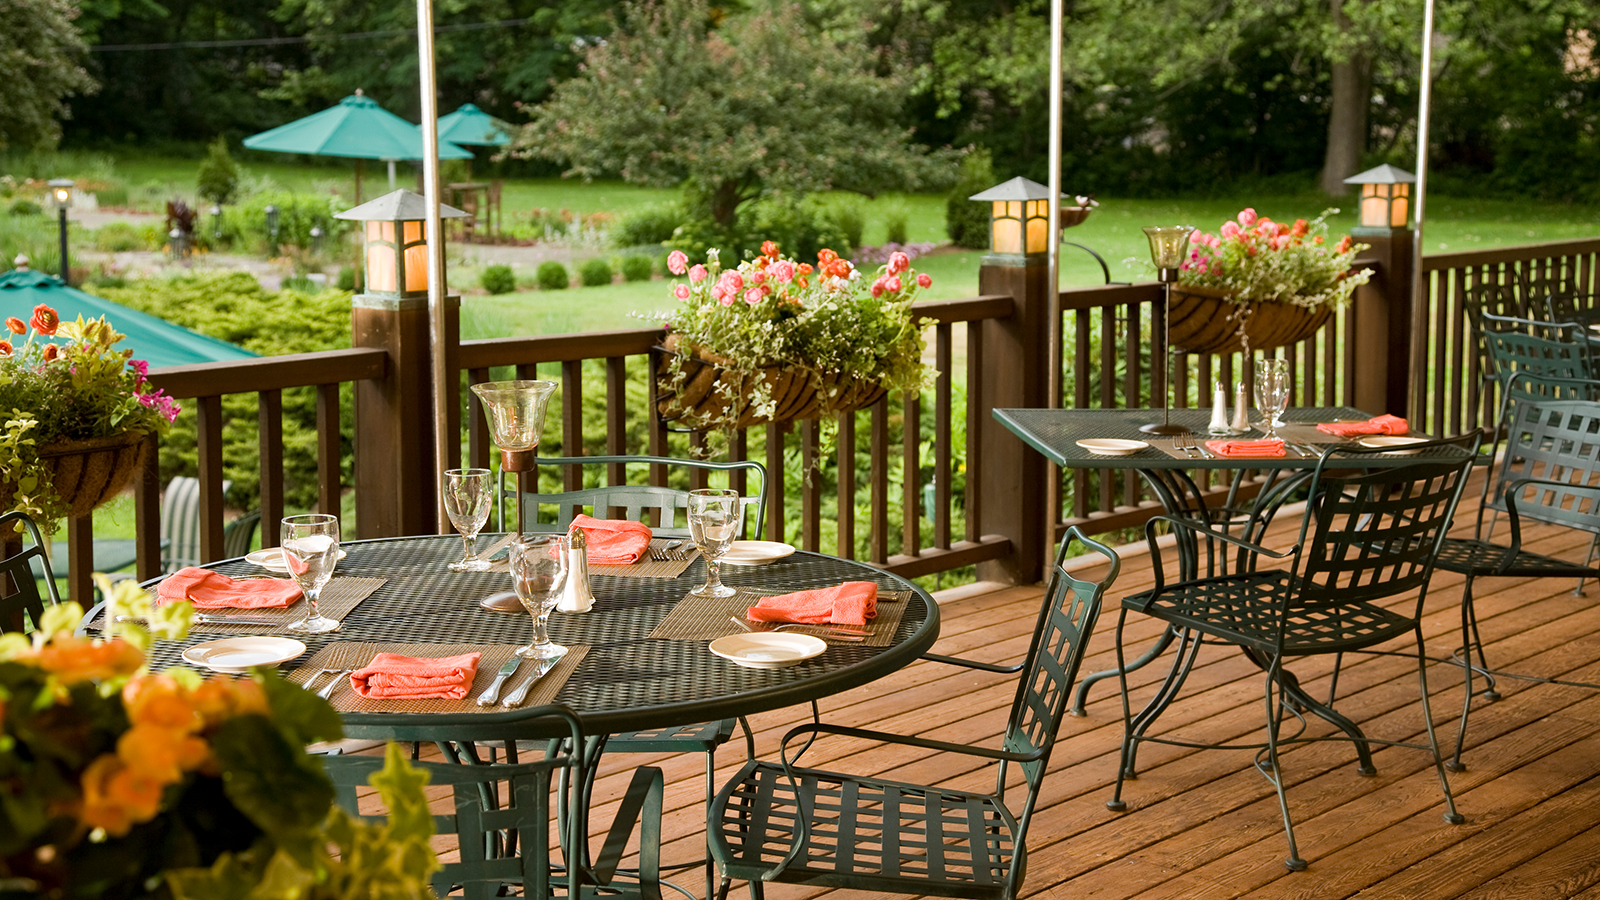 Image of the Settlers Inn Restaurant in Hawley, Pennsylvania